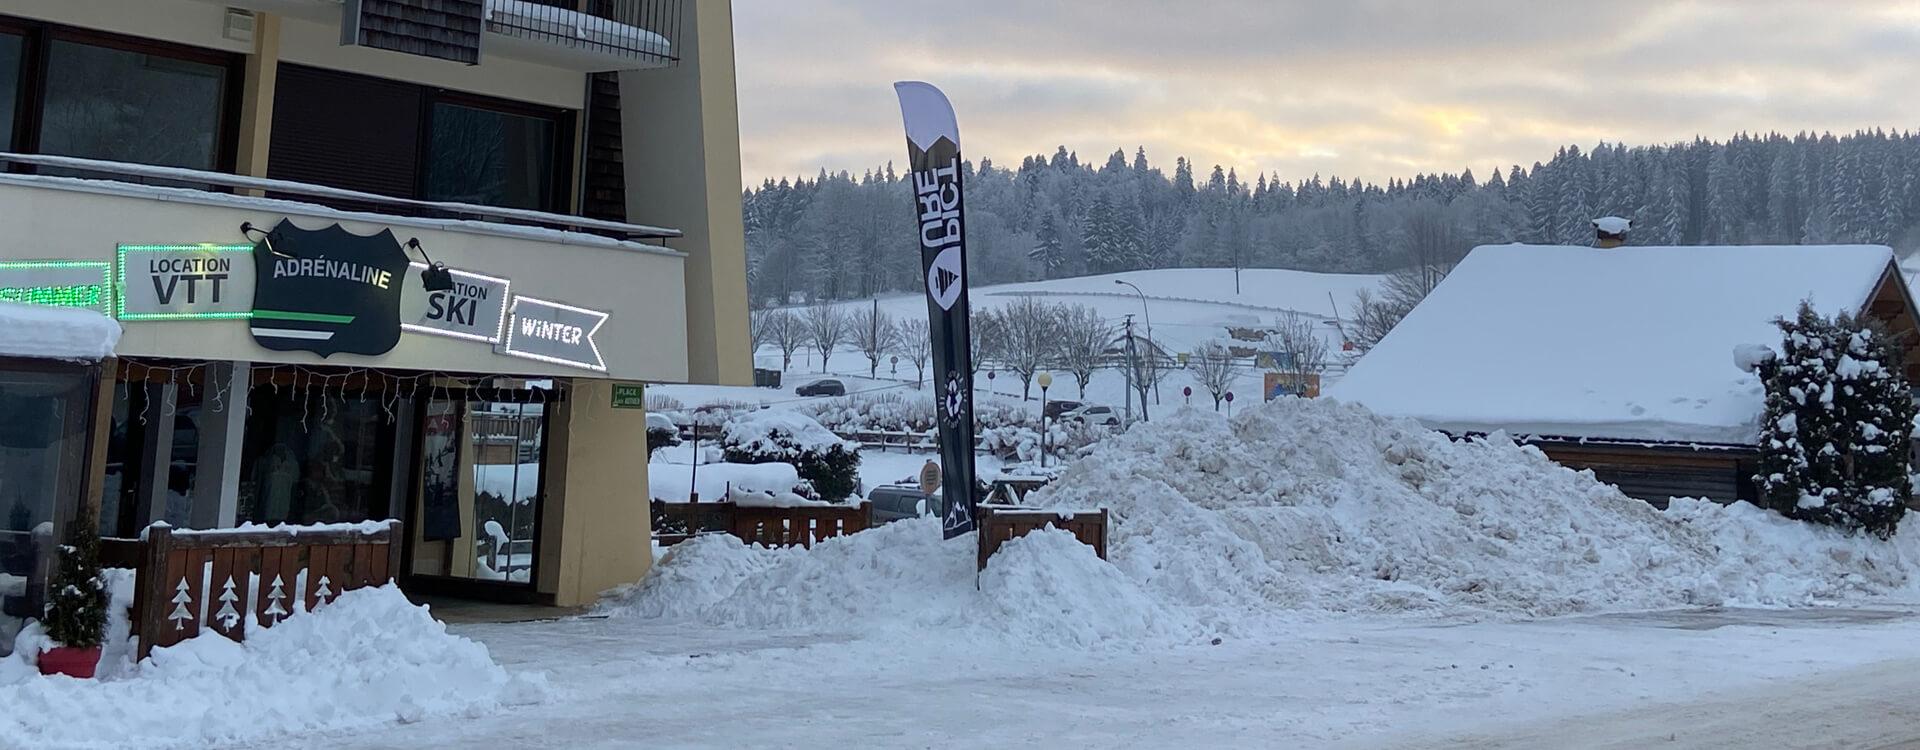 Adrénaline Location Ski Métabief Mont d'Or